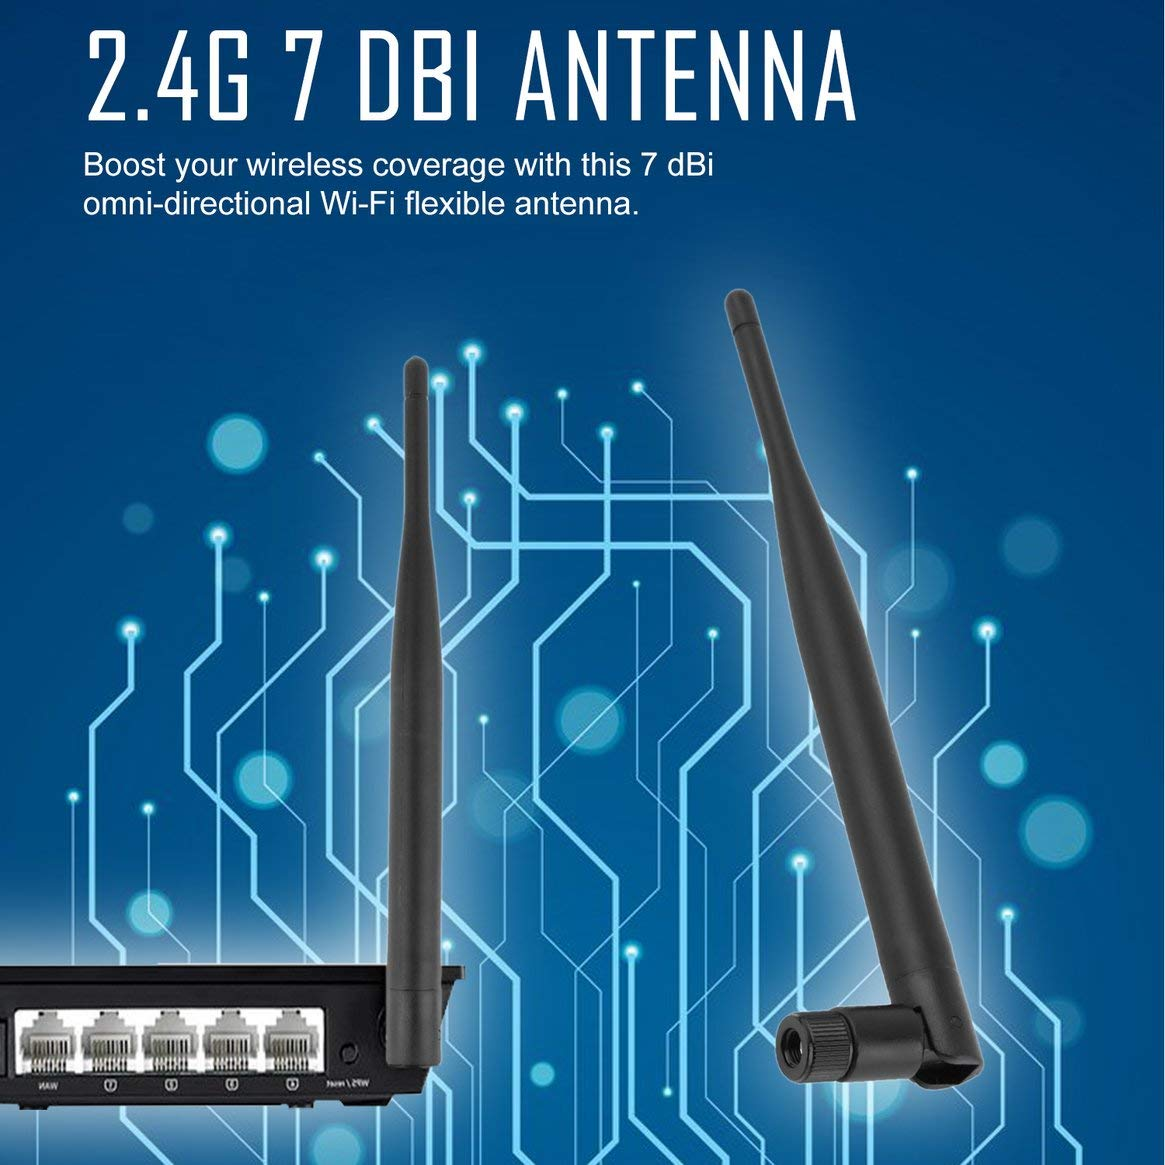 Delicacydex Professionelle Universal Wireless Wifi Antenne Booster 2,4 GHz 7dBi Wifi Antenne Booster WLAN RP-SMA f PCI Karte Modem Router